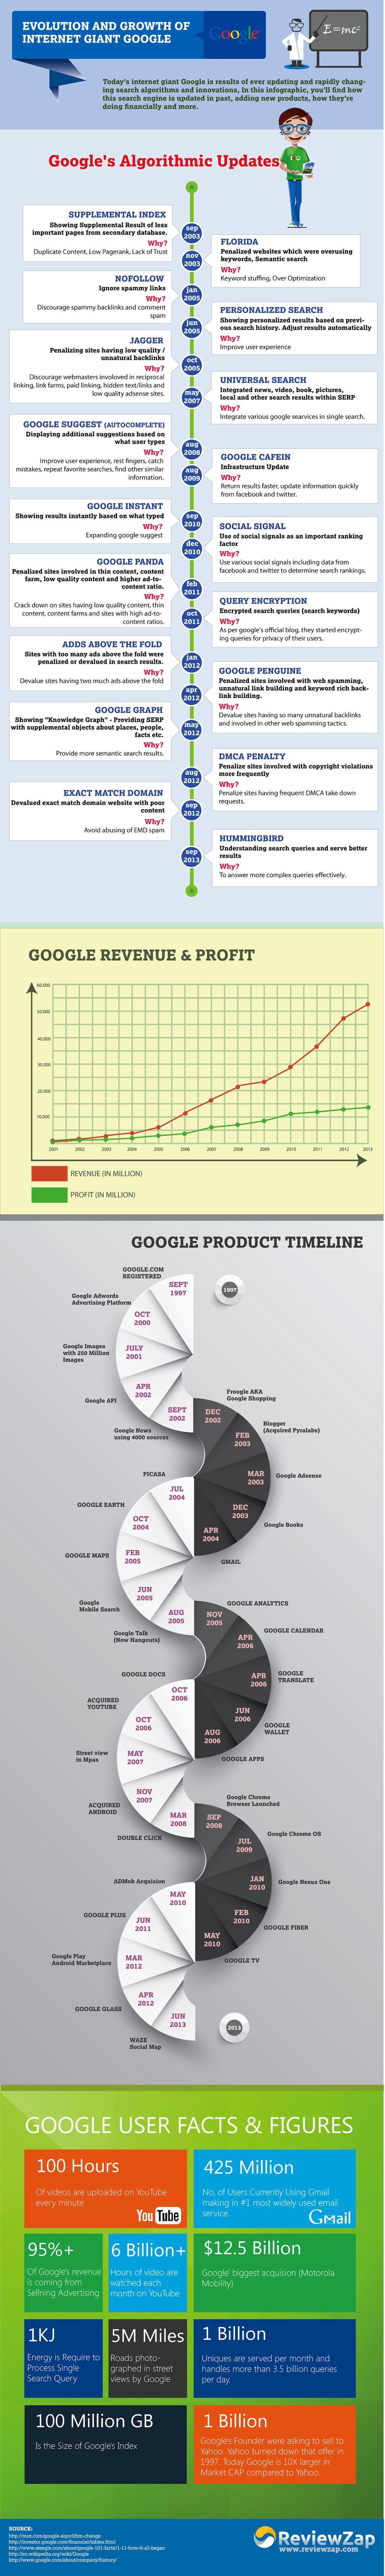 evolution of Google Search